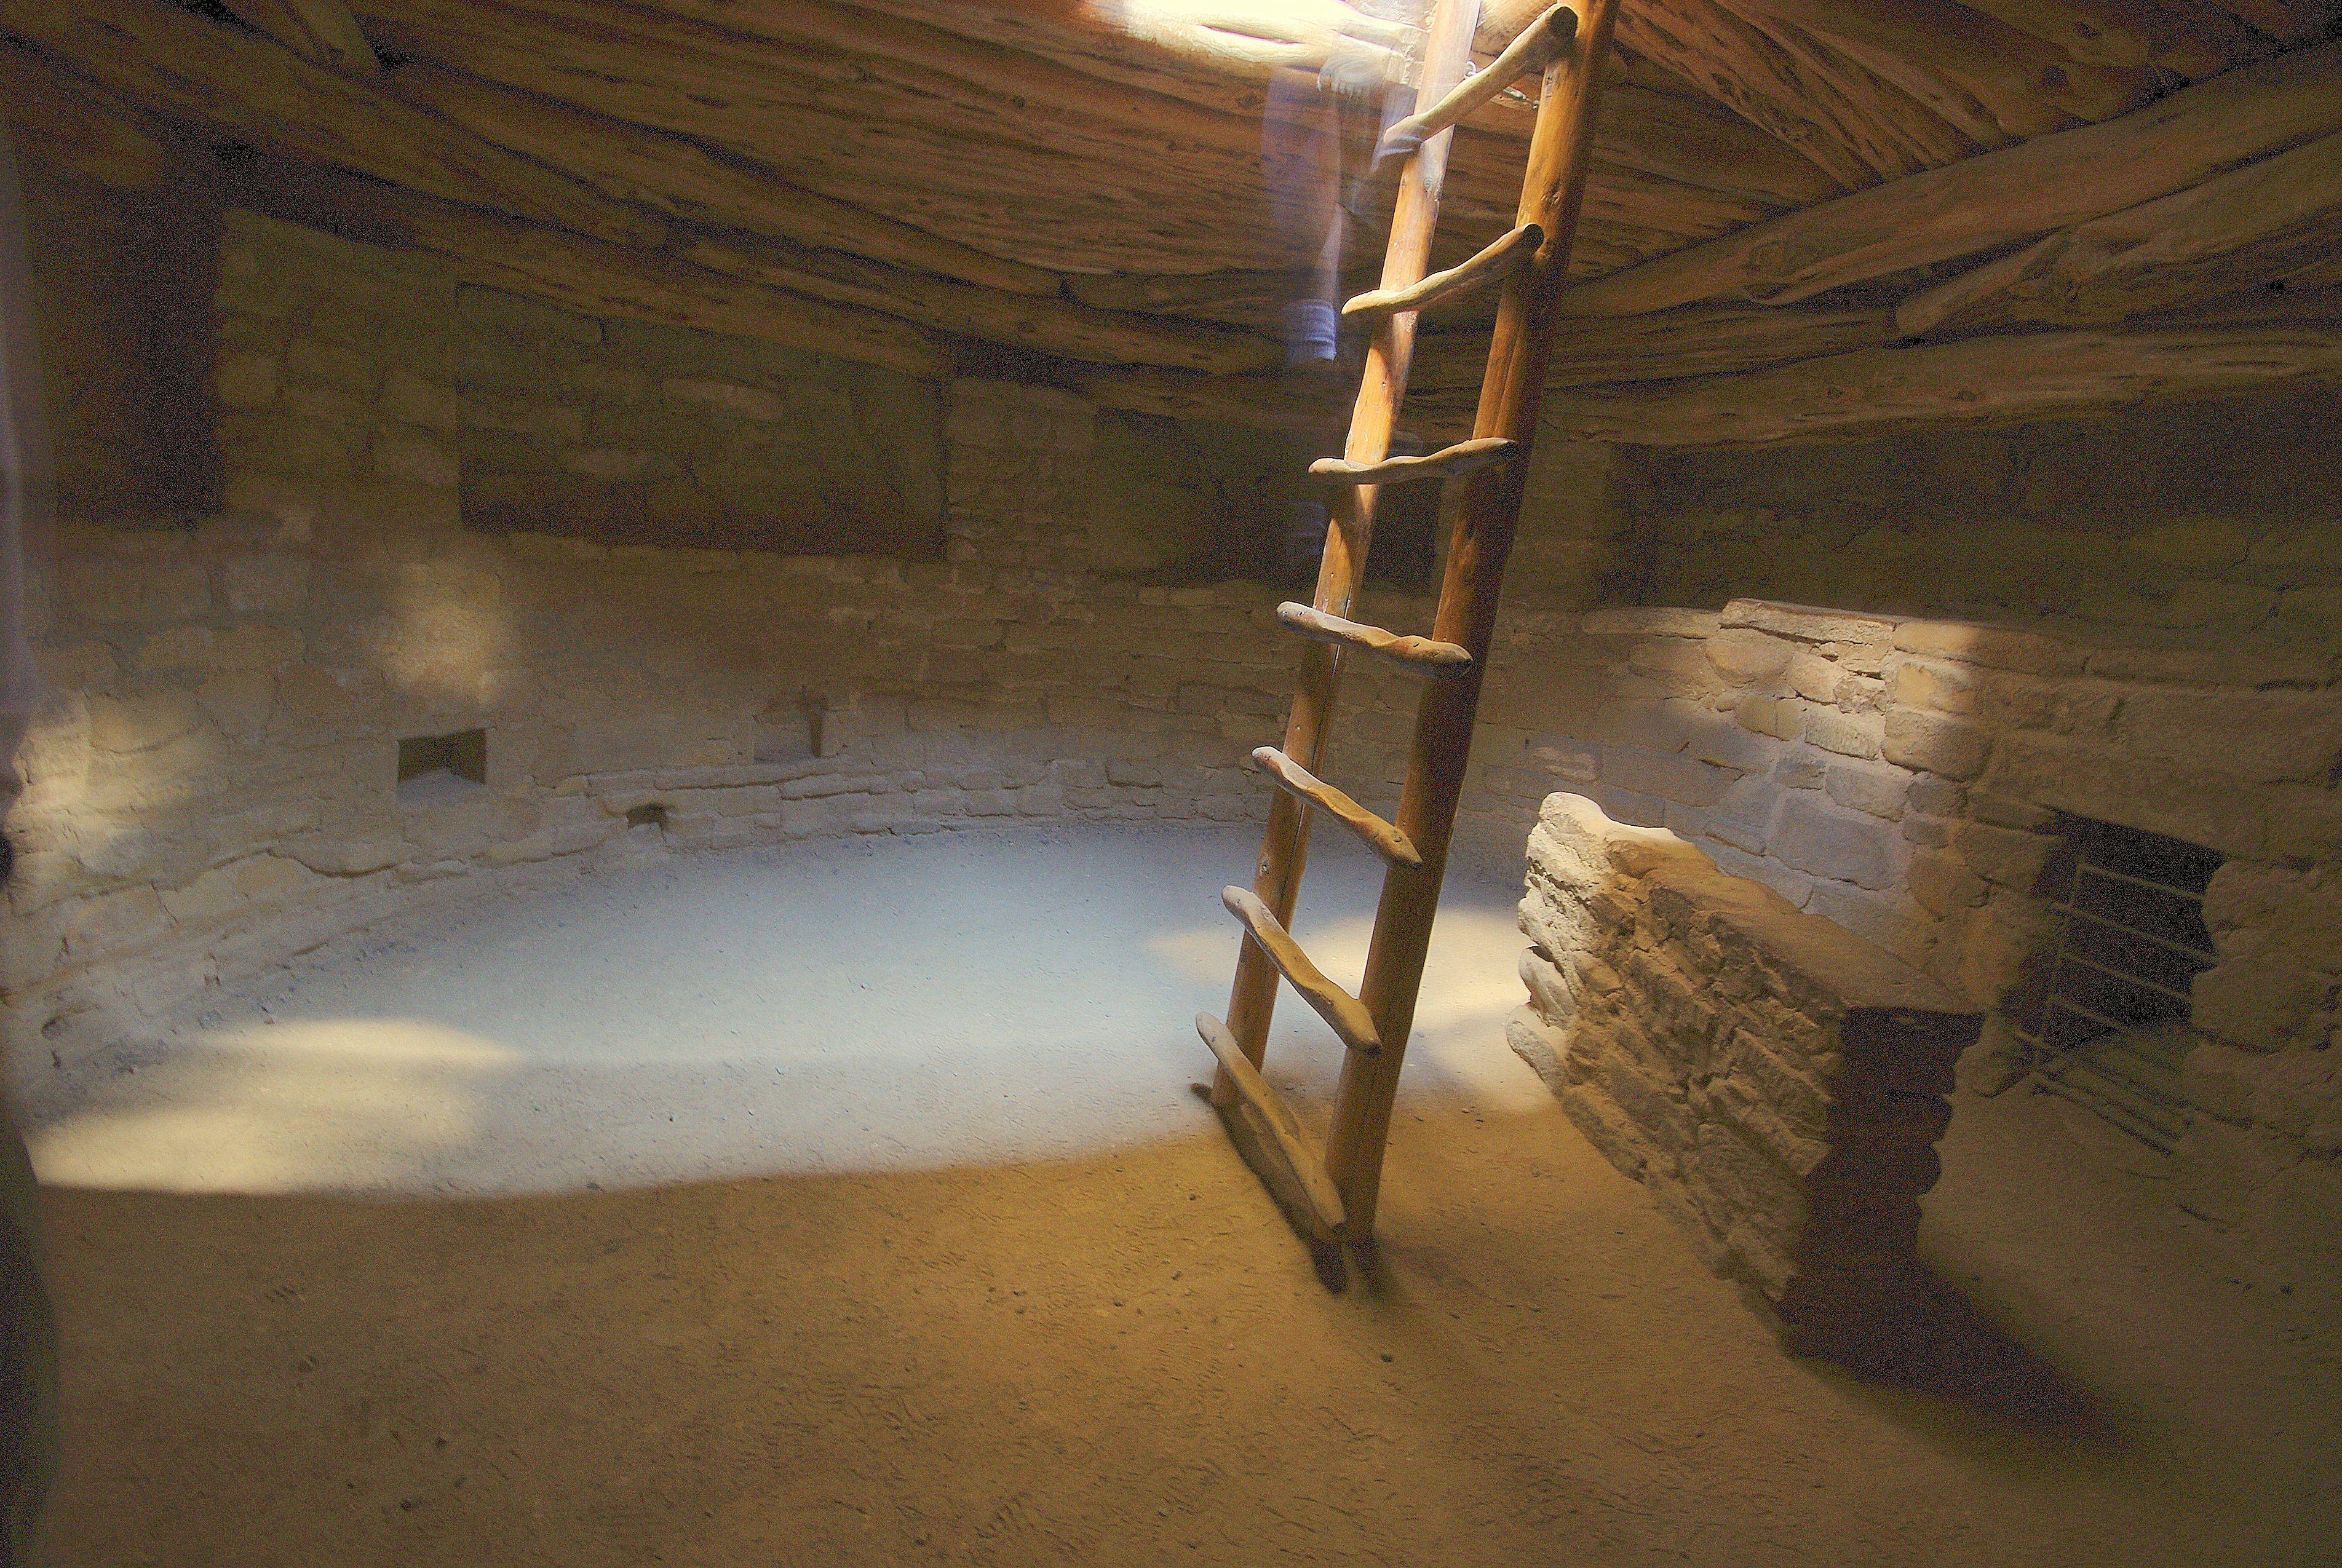 Kiva ancestral pueblo ceremonial structures for Kiva house